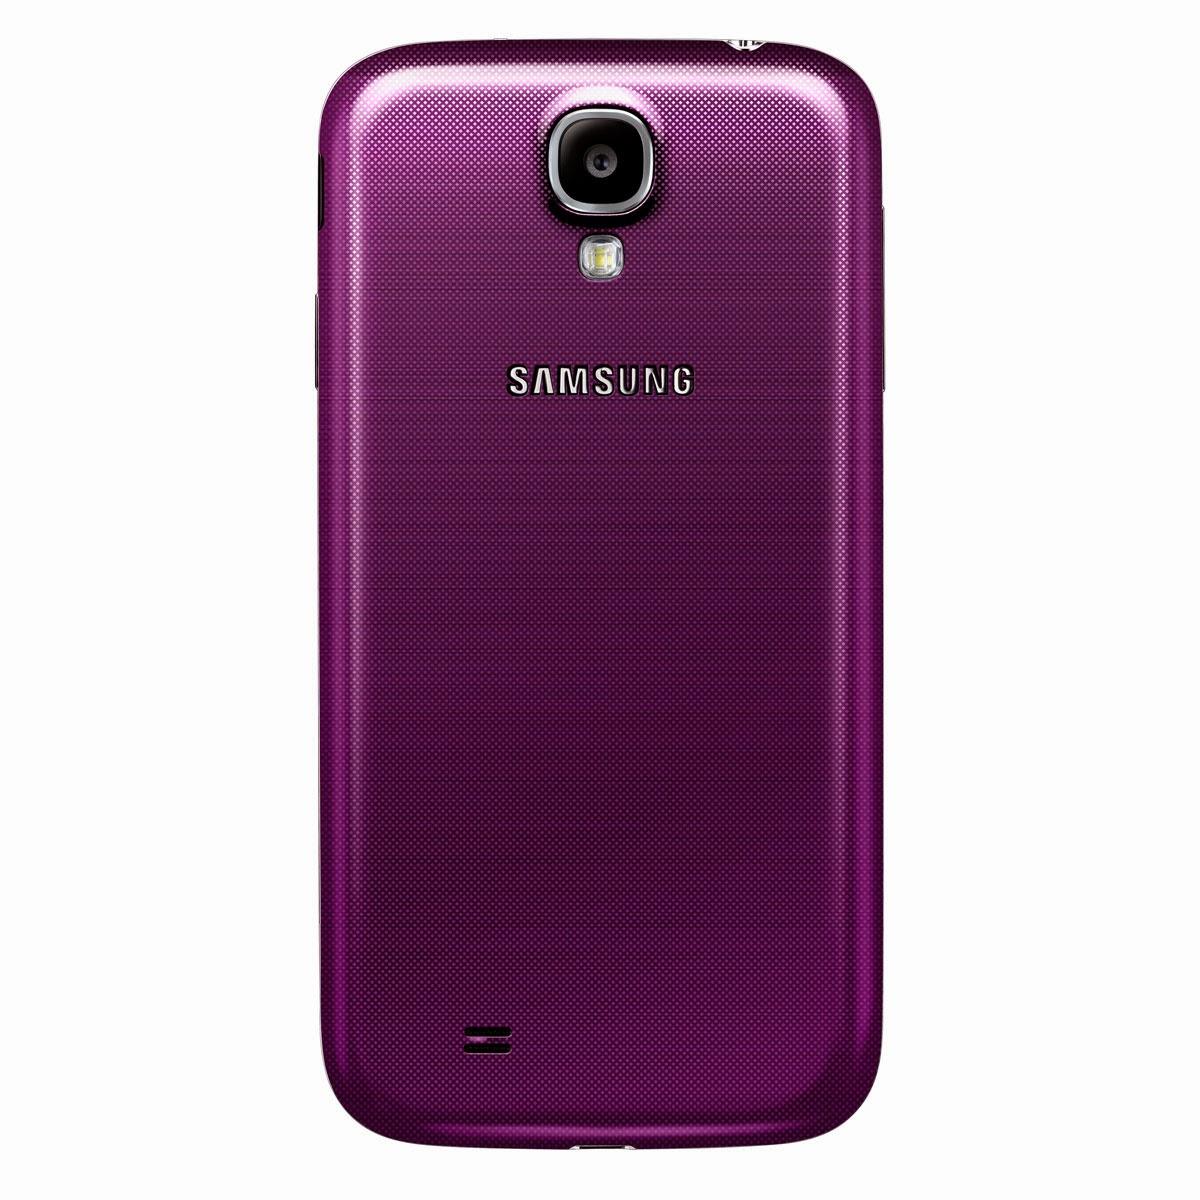 Samsung Galaxy S4 Violet 4G 16Go Smartphone